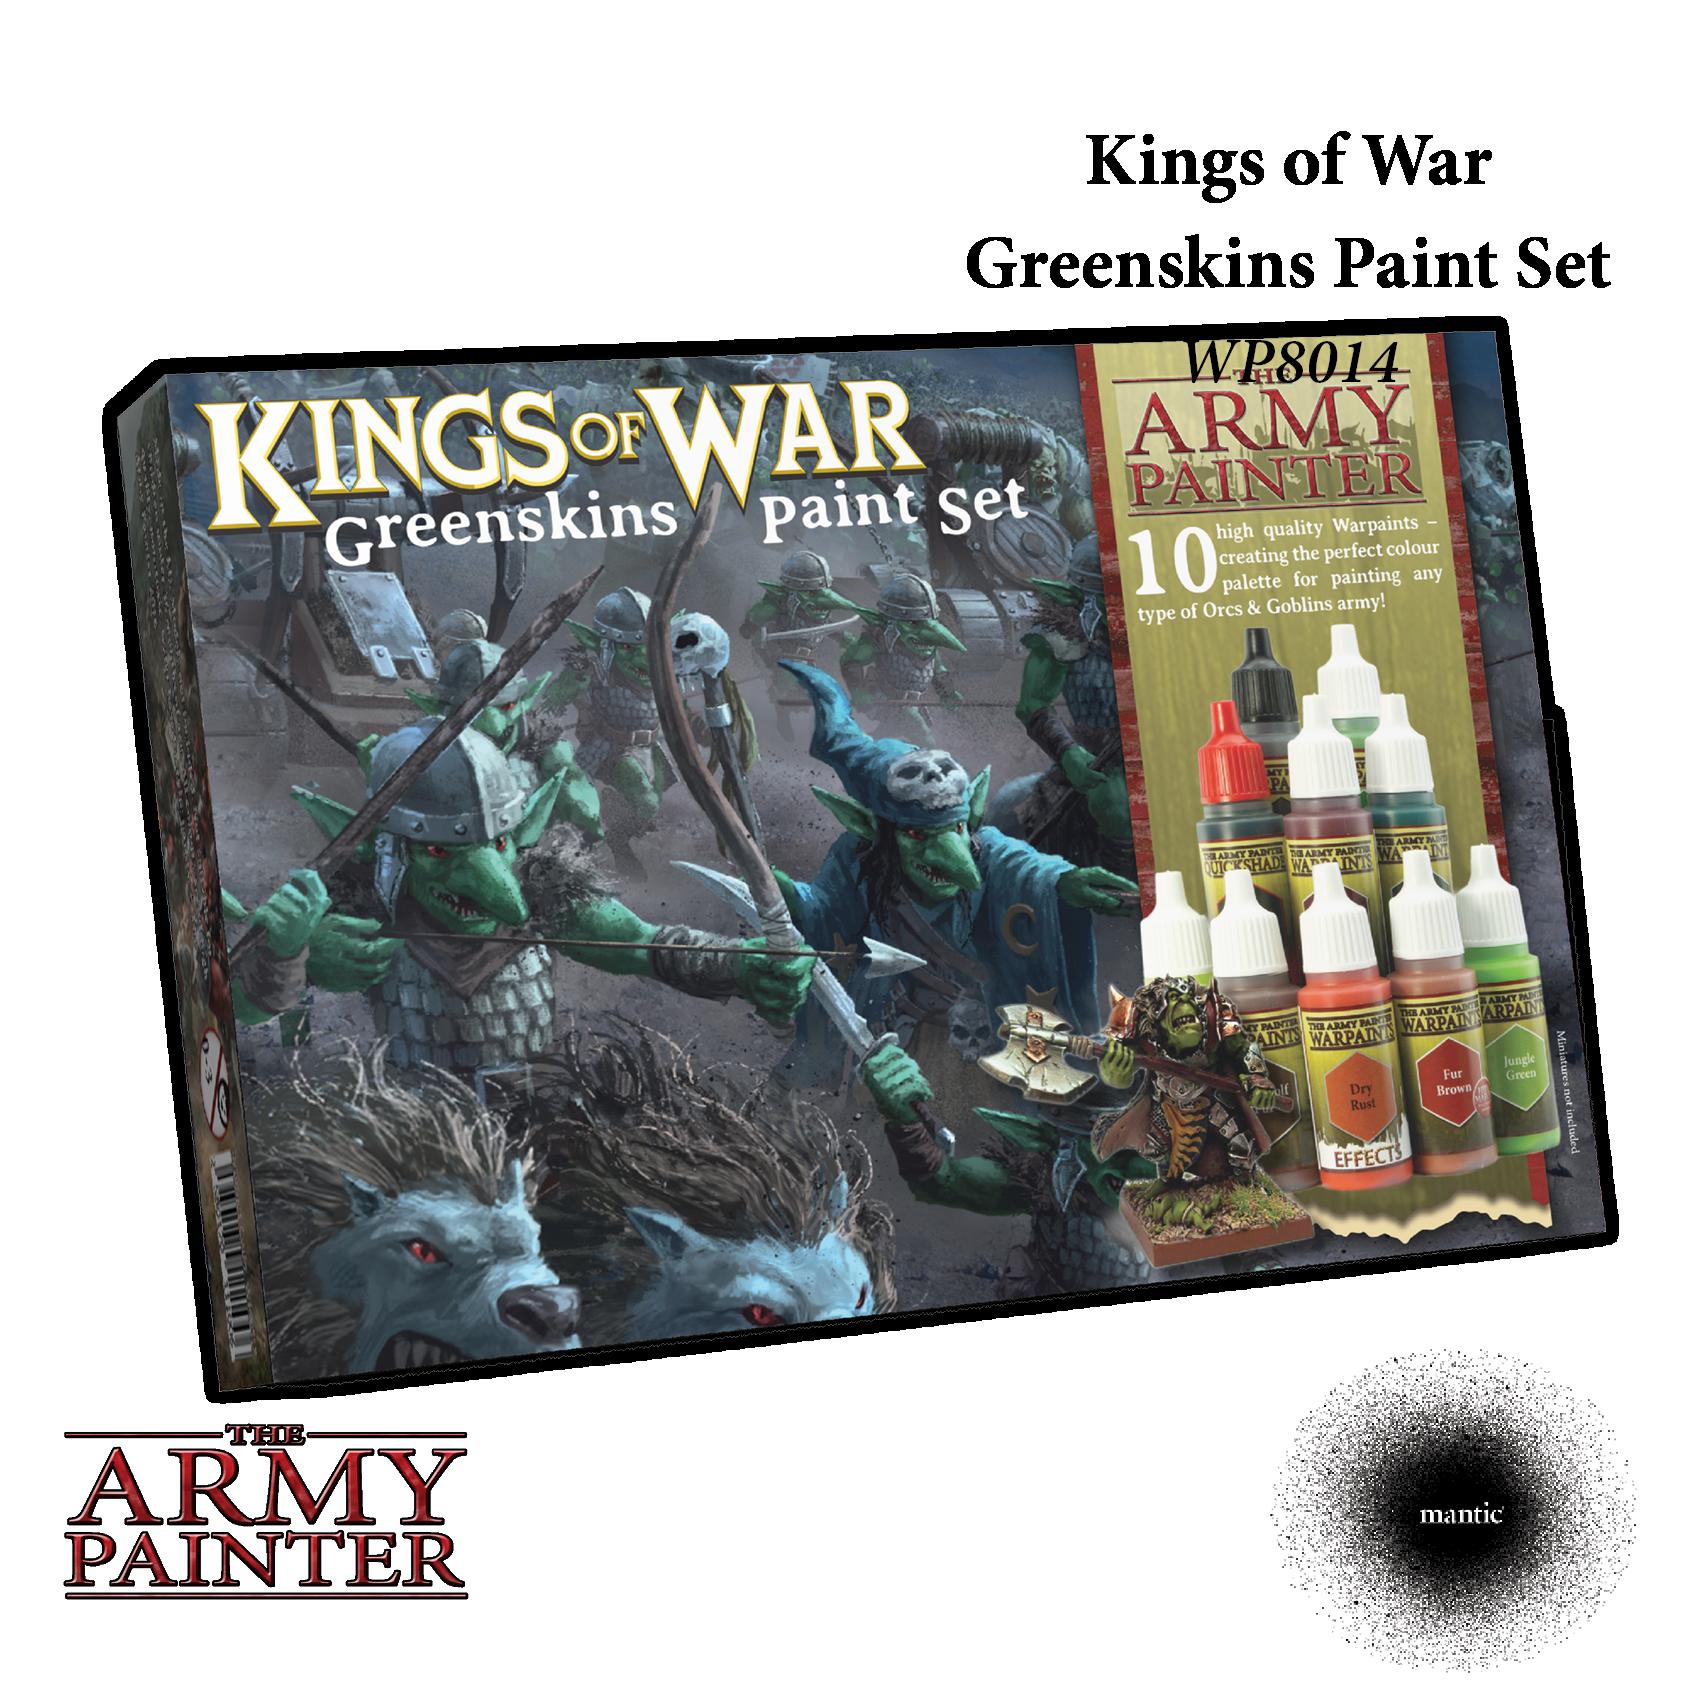 Kings of War: Greenskins Paint Set